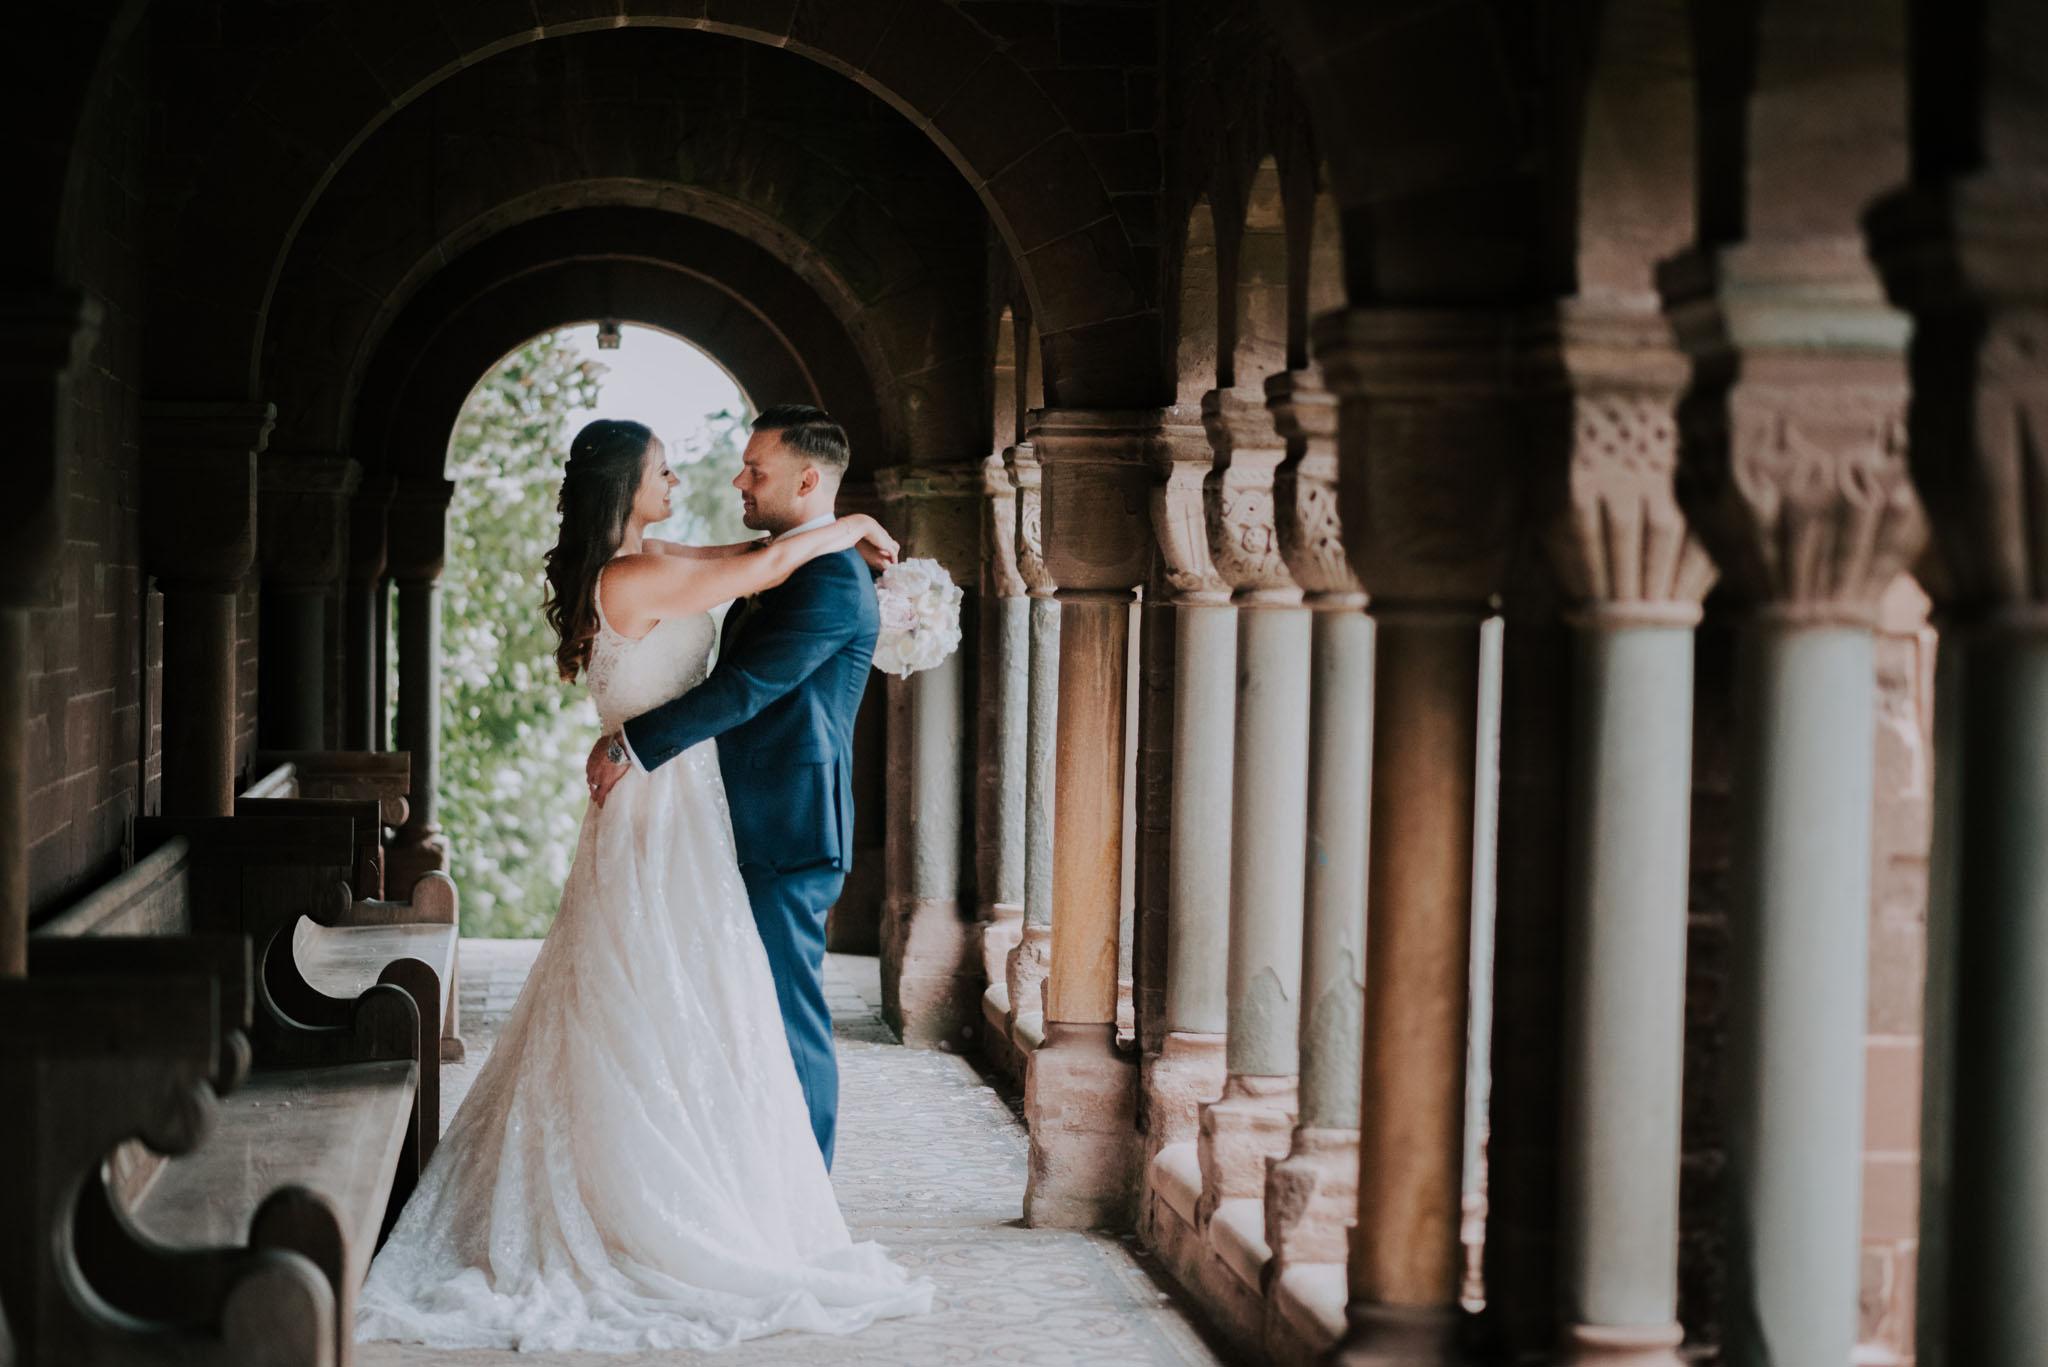 wedding-photographer-glewstone-court-hereford-scott-stockwell-photography297.jpg